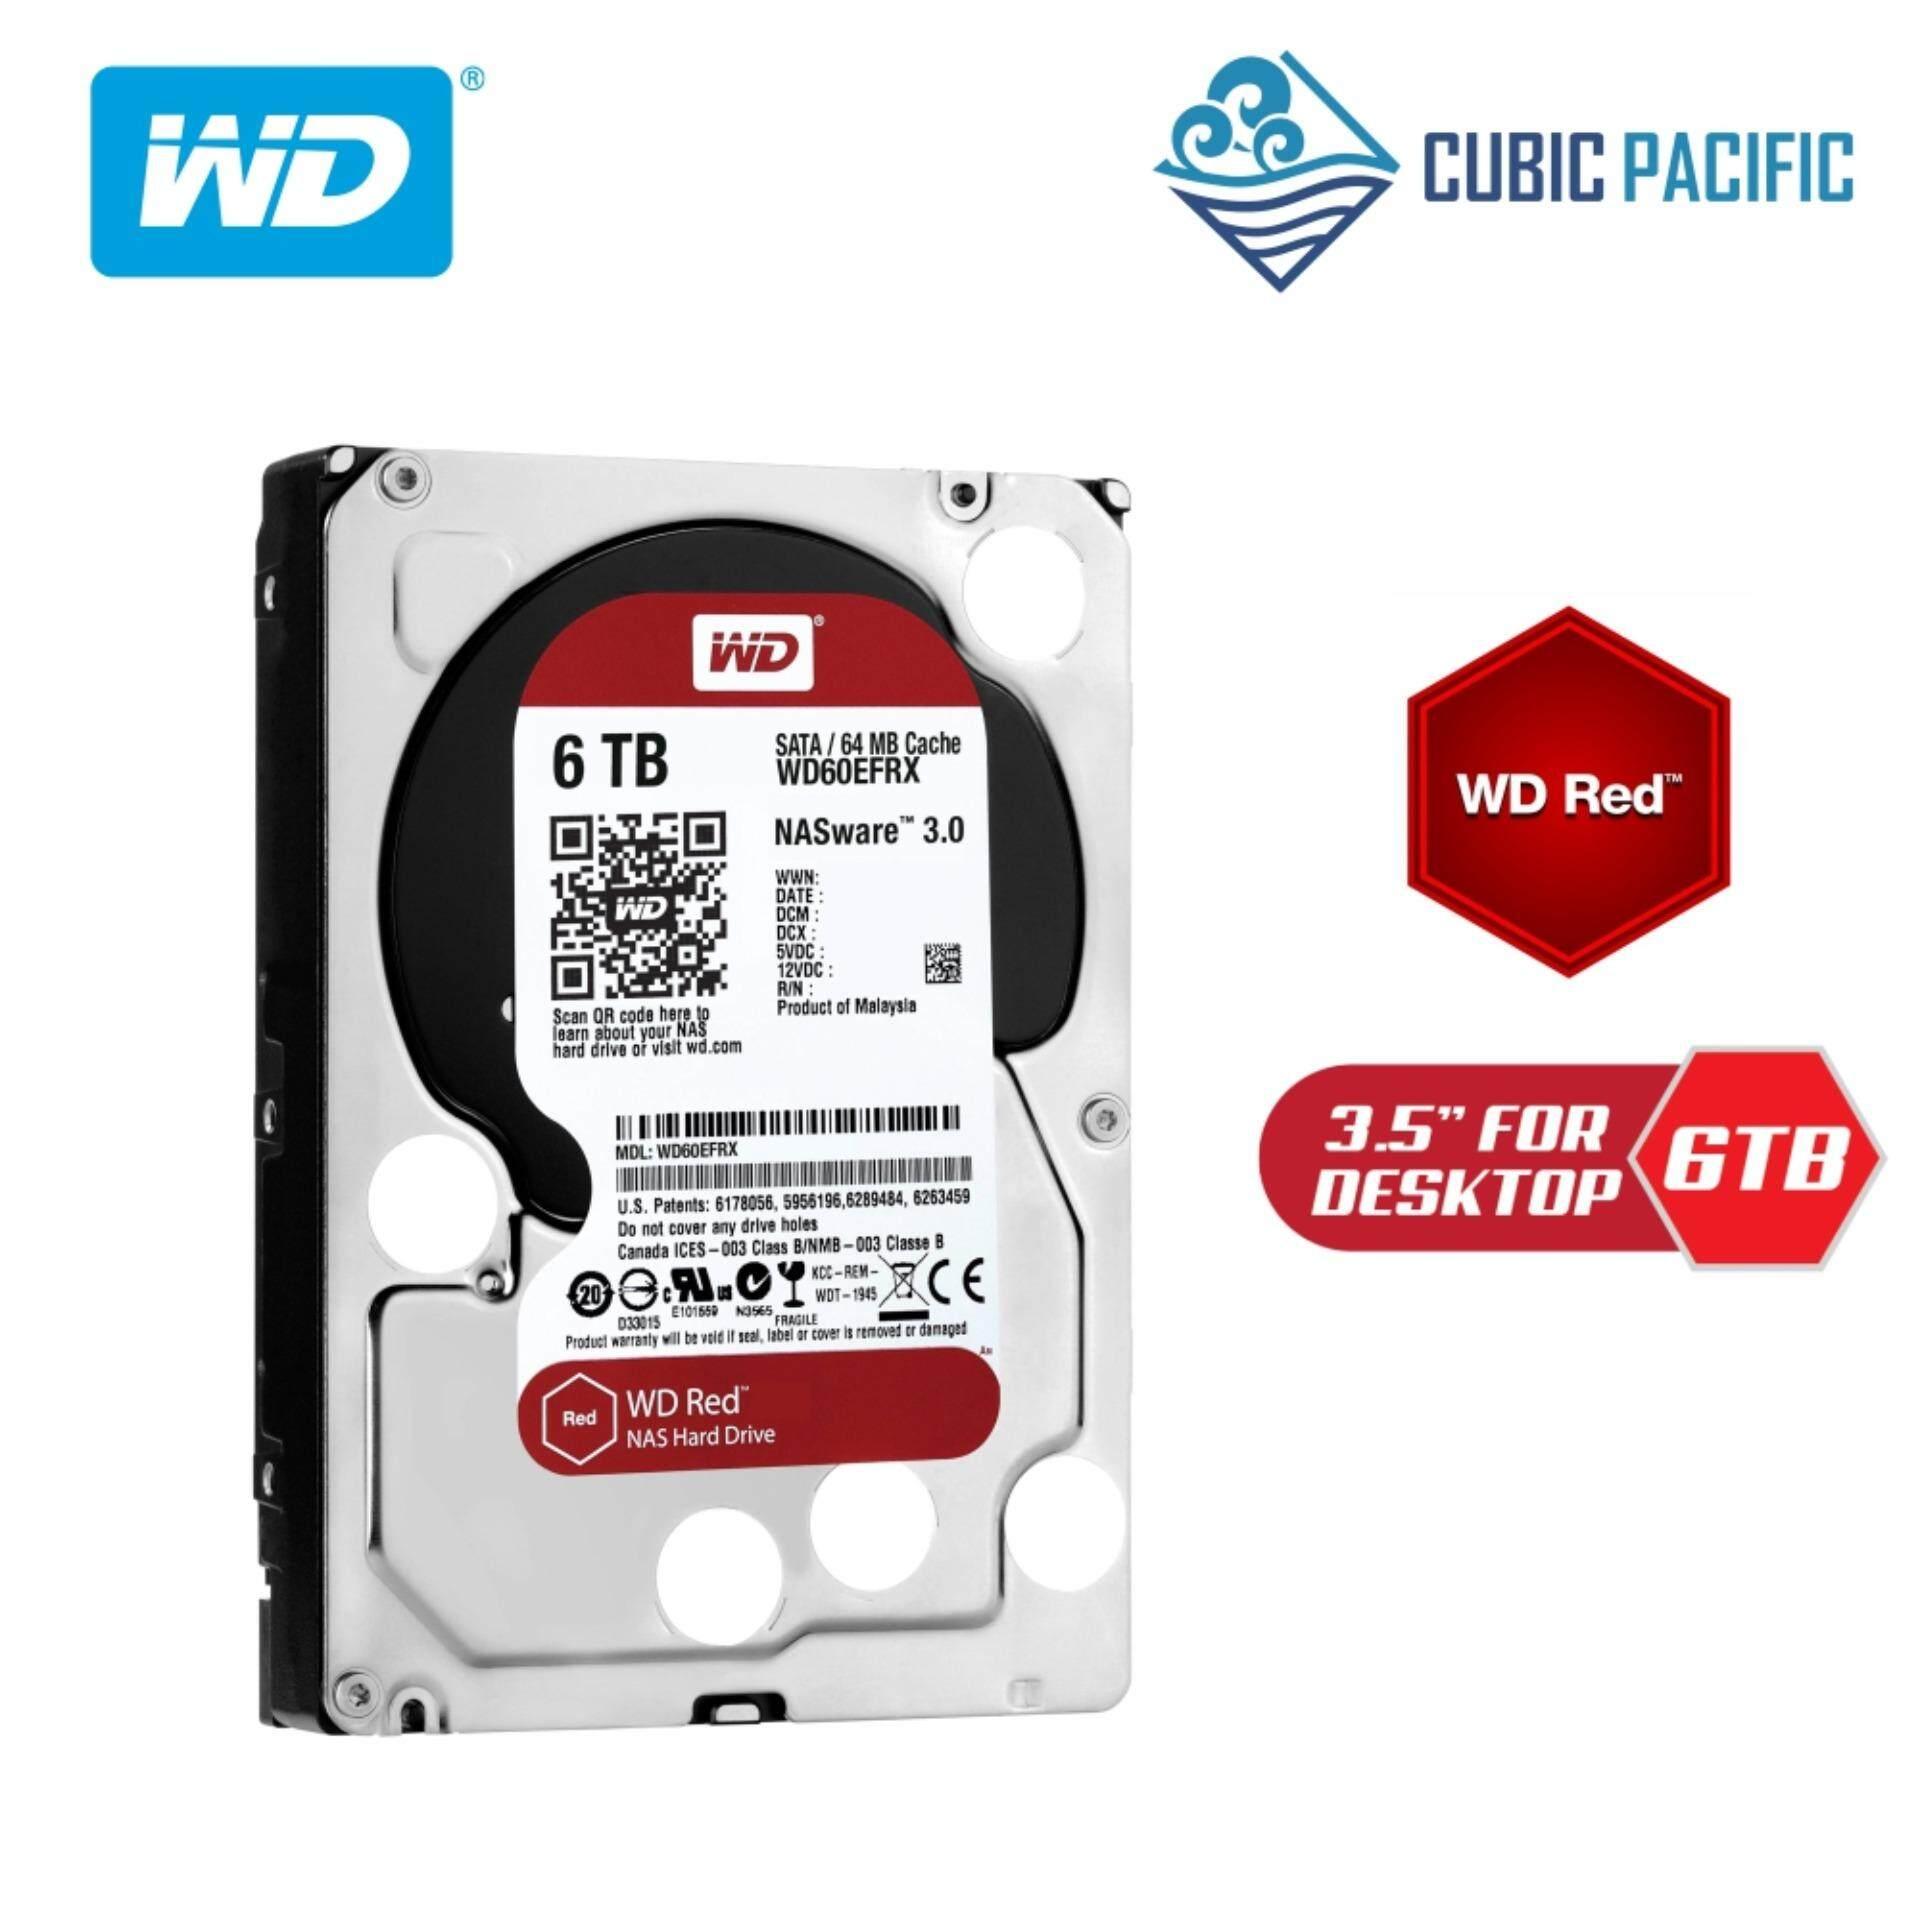 Sell Toshiba 6tb Nearline Cheapest Best Quality My Store Seagate Backup Plus Desktop Hub 8tb Hdd External 35 Inch 3 Year Warranty New Original Myr 899 Western Digital Wd Red Nas 35myr899 900